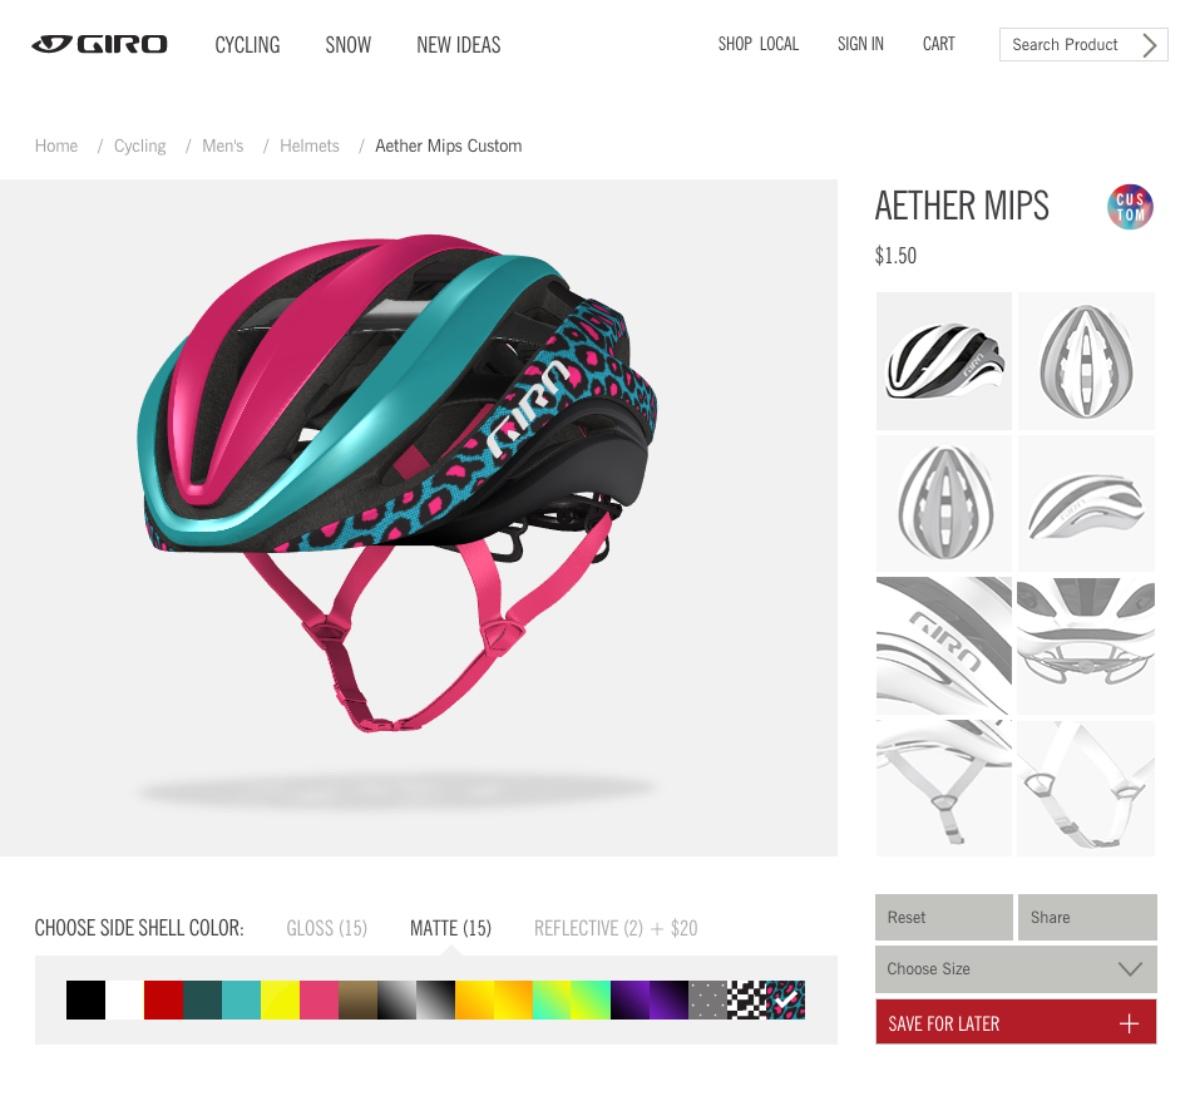 Giro Aether MIPS Custom